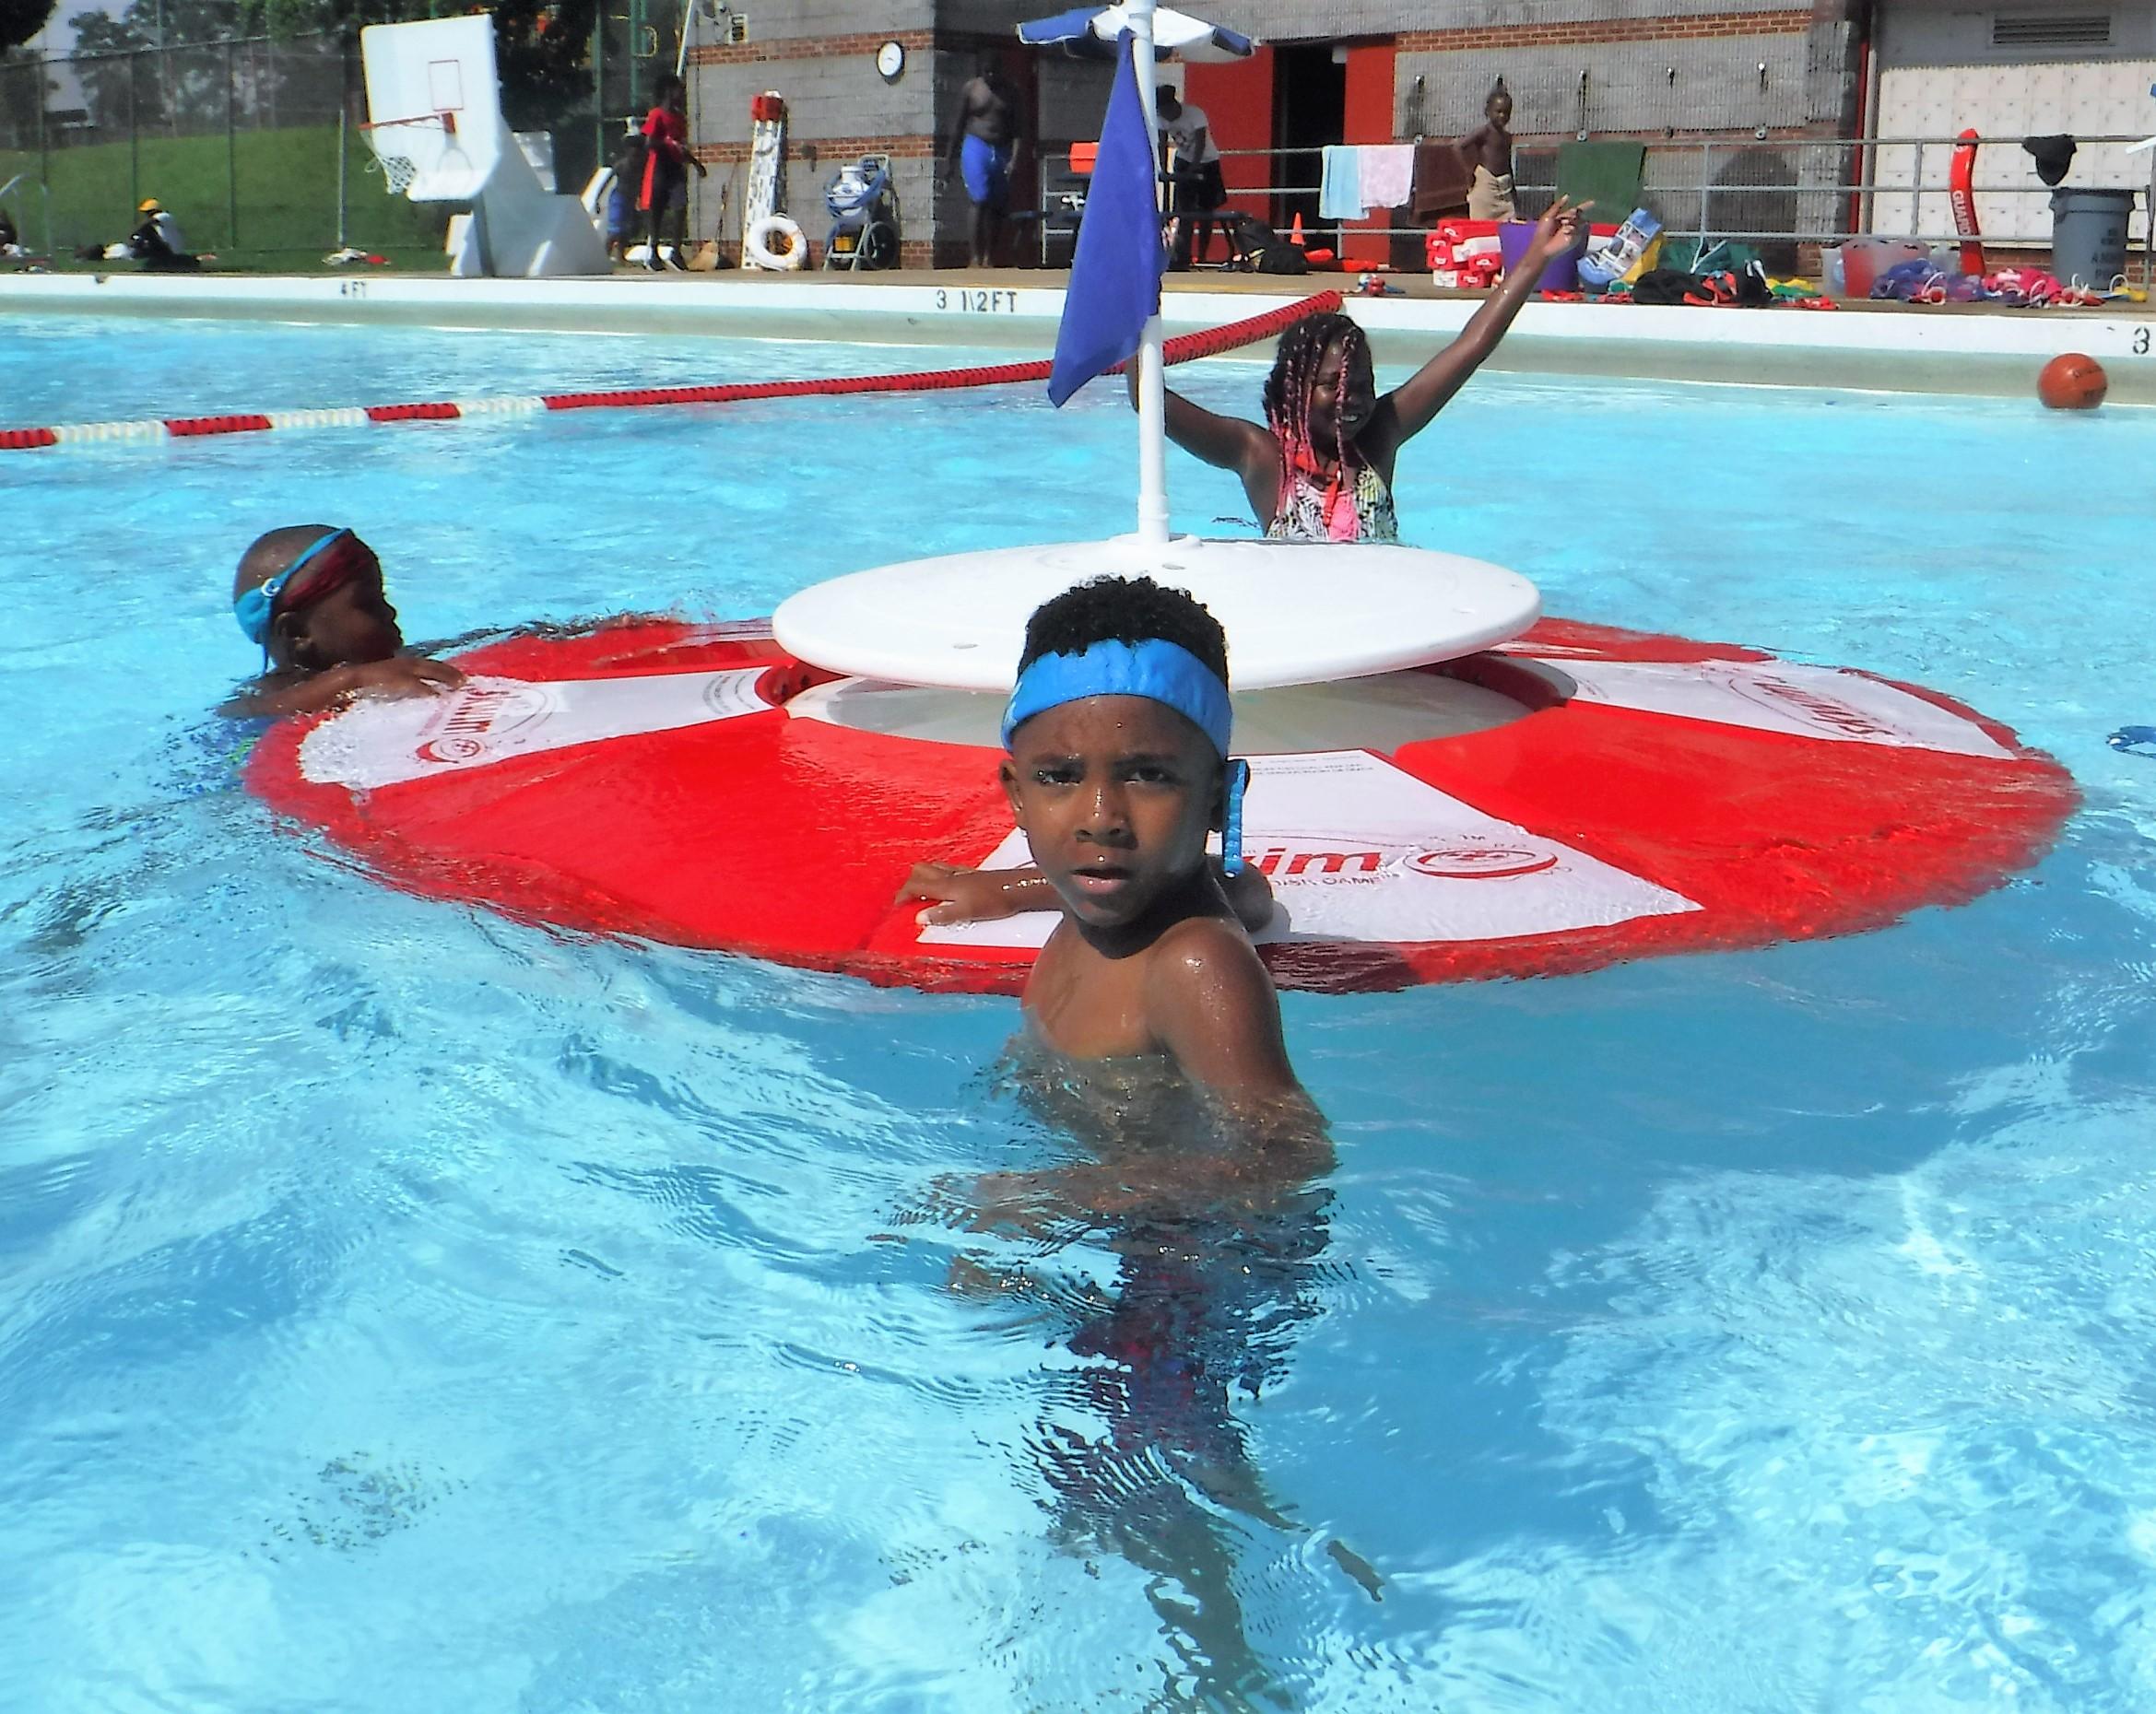 Ammon Swimming Pool: Scoring Goals